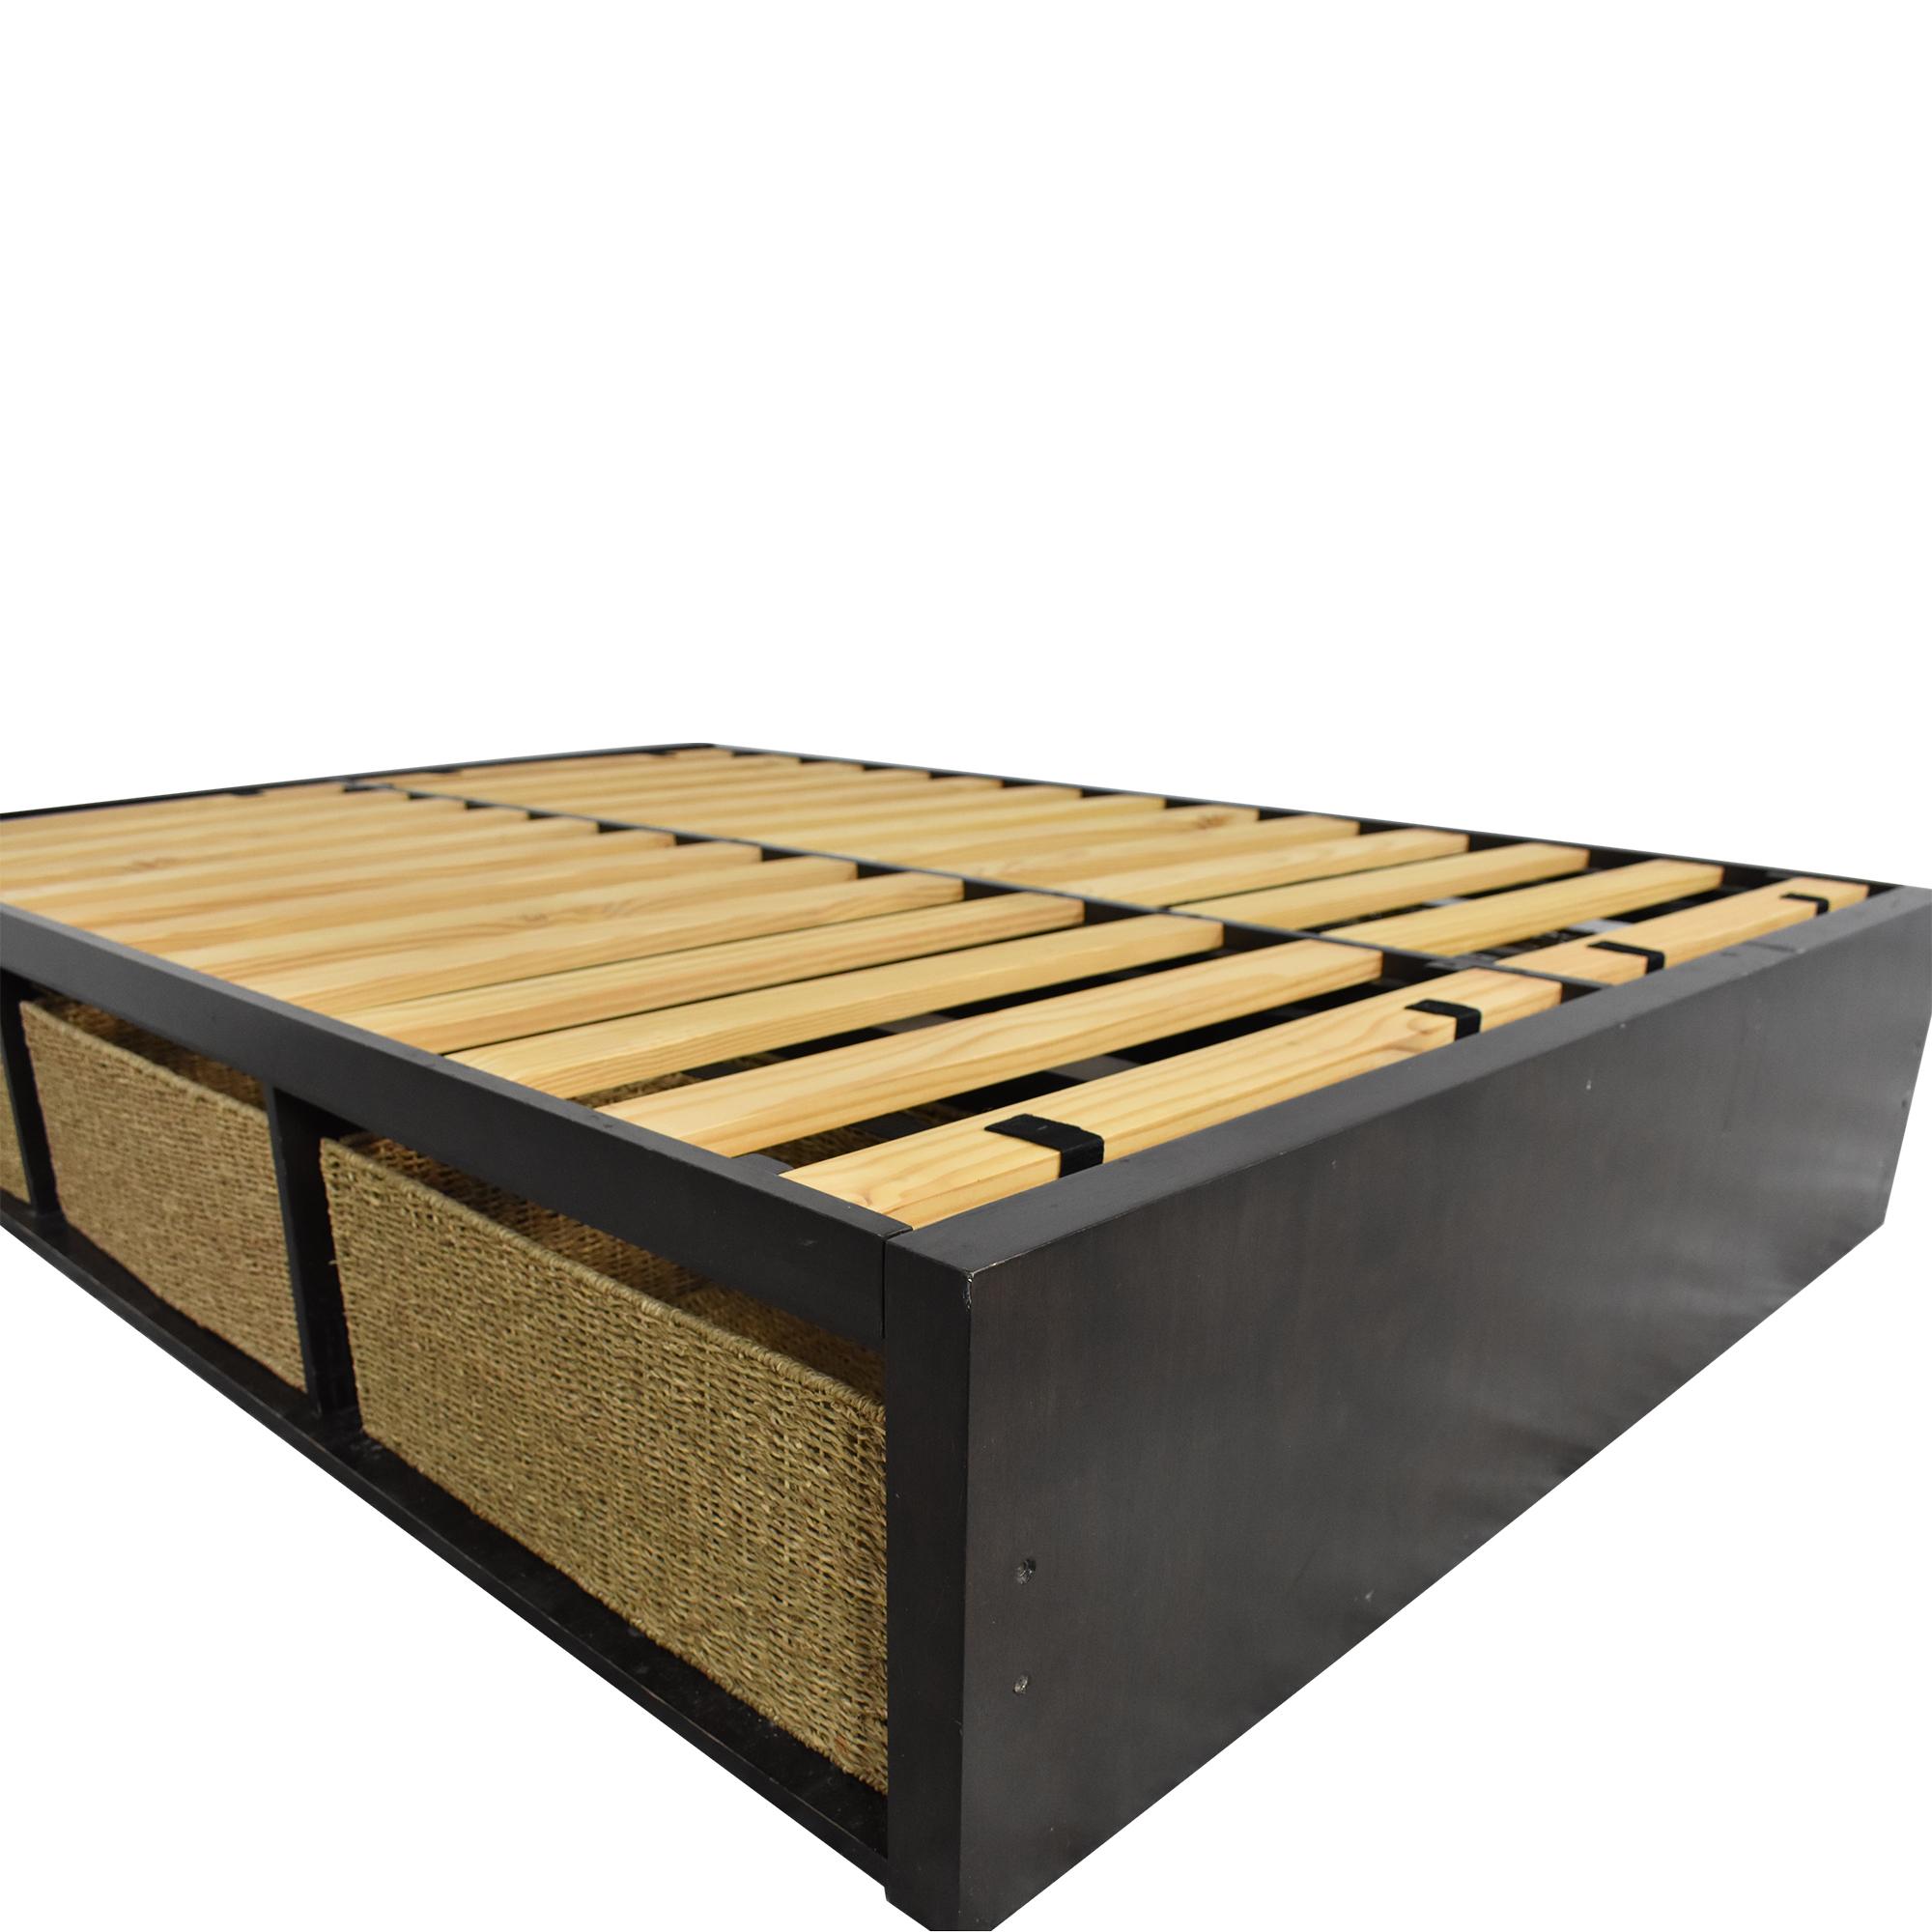 West Elm West Elm Sylvan Full Storage Bed second hand